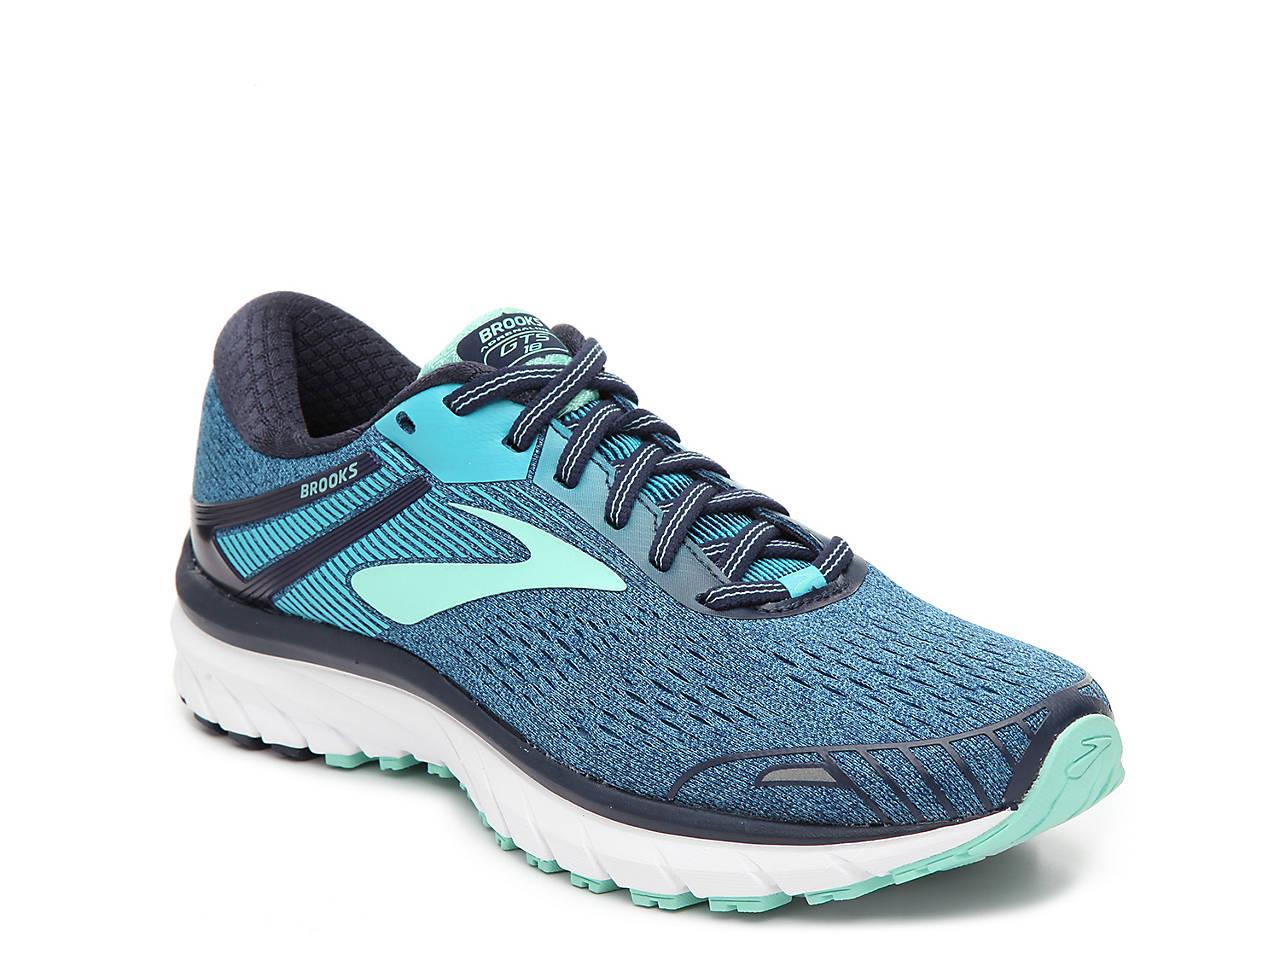 4996c9c2181c4 Brooks Adrenaline GTS 18 Lightweight Running Shoe - Women s Men s Shoes